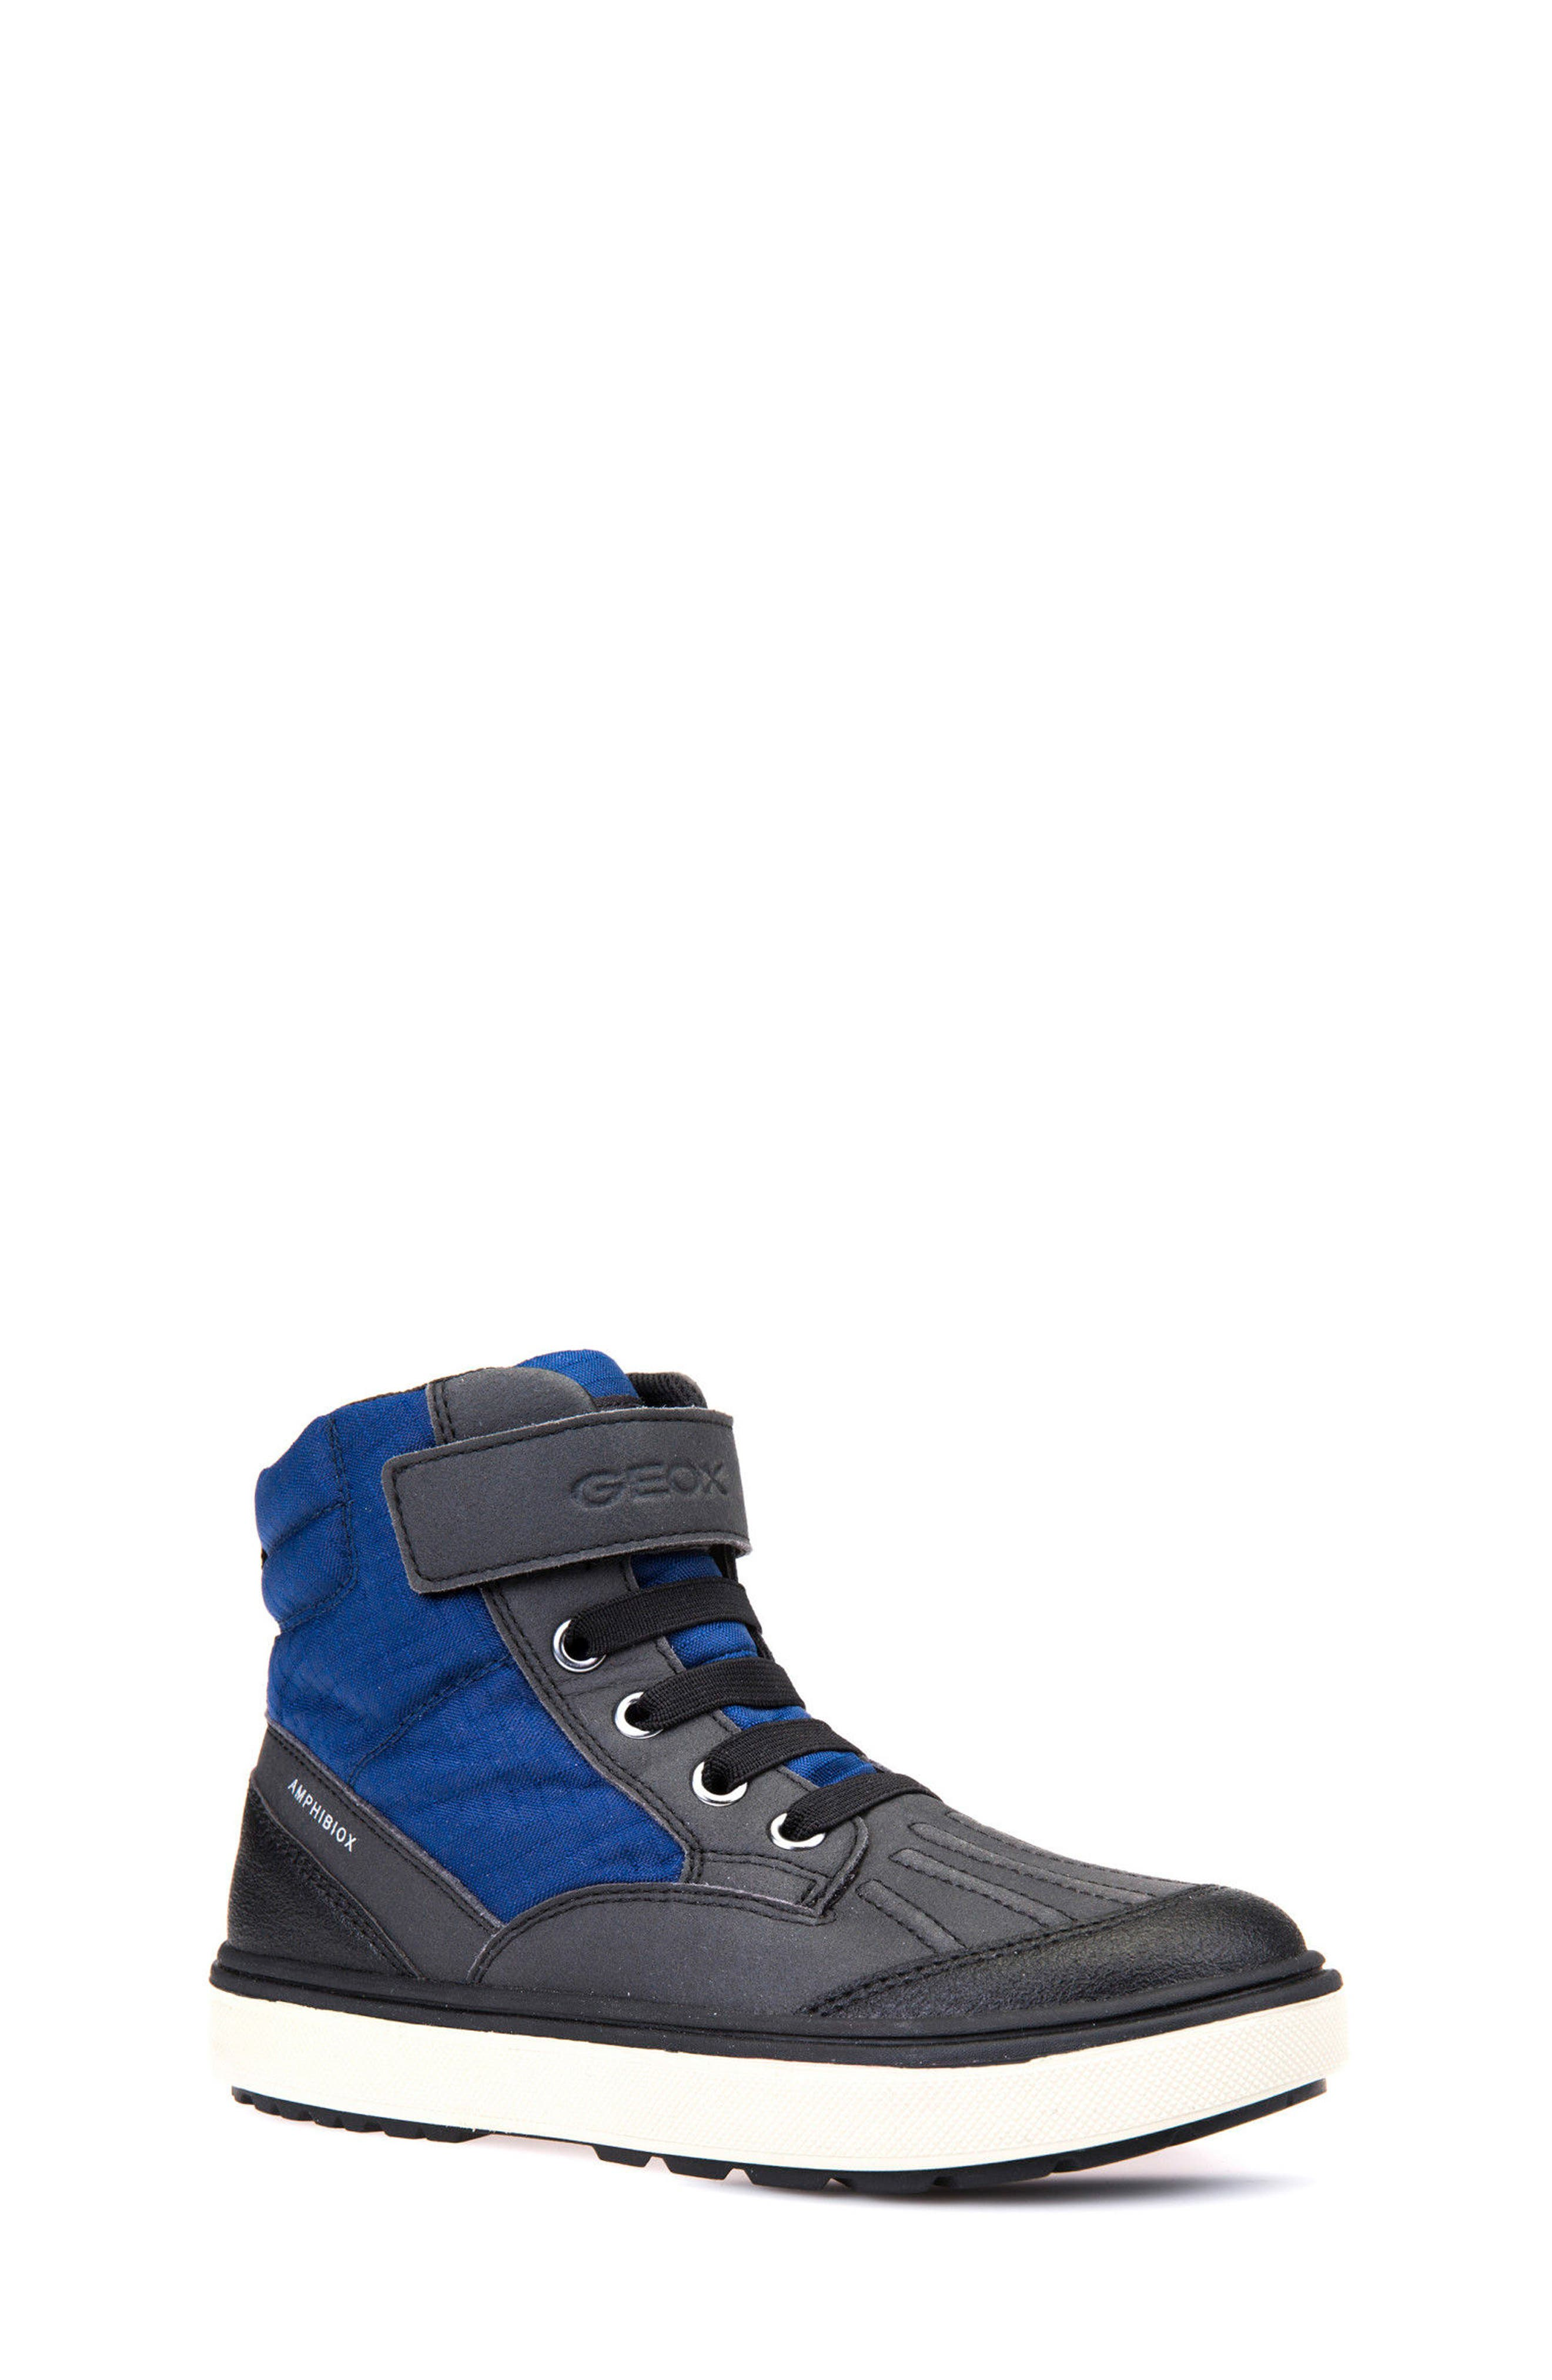 Main Image - Geox 'Mattias - ABX' Amphibiox® Waterproof Sneaker (Toddler, Little Kid & Big Kid)